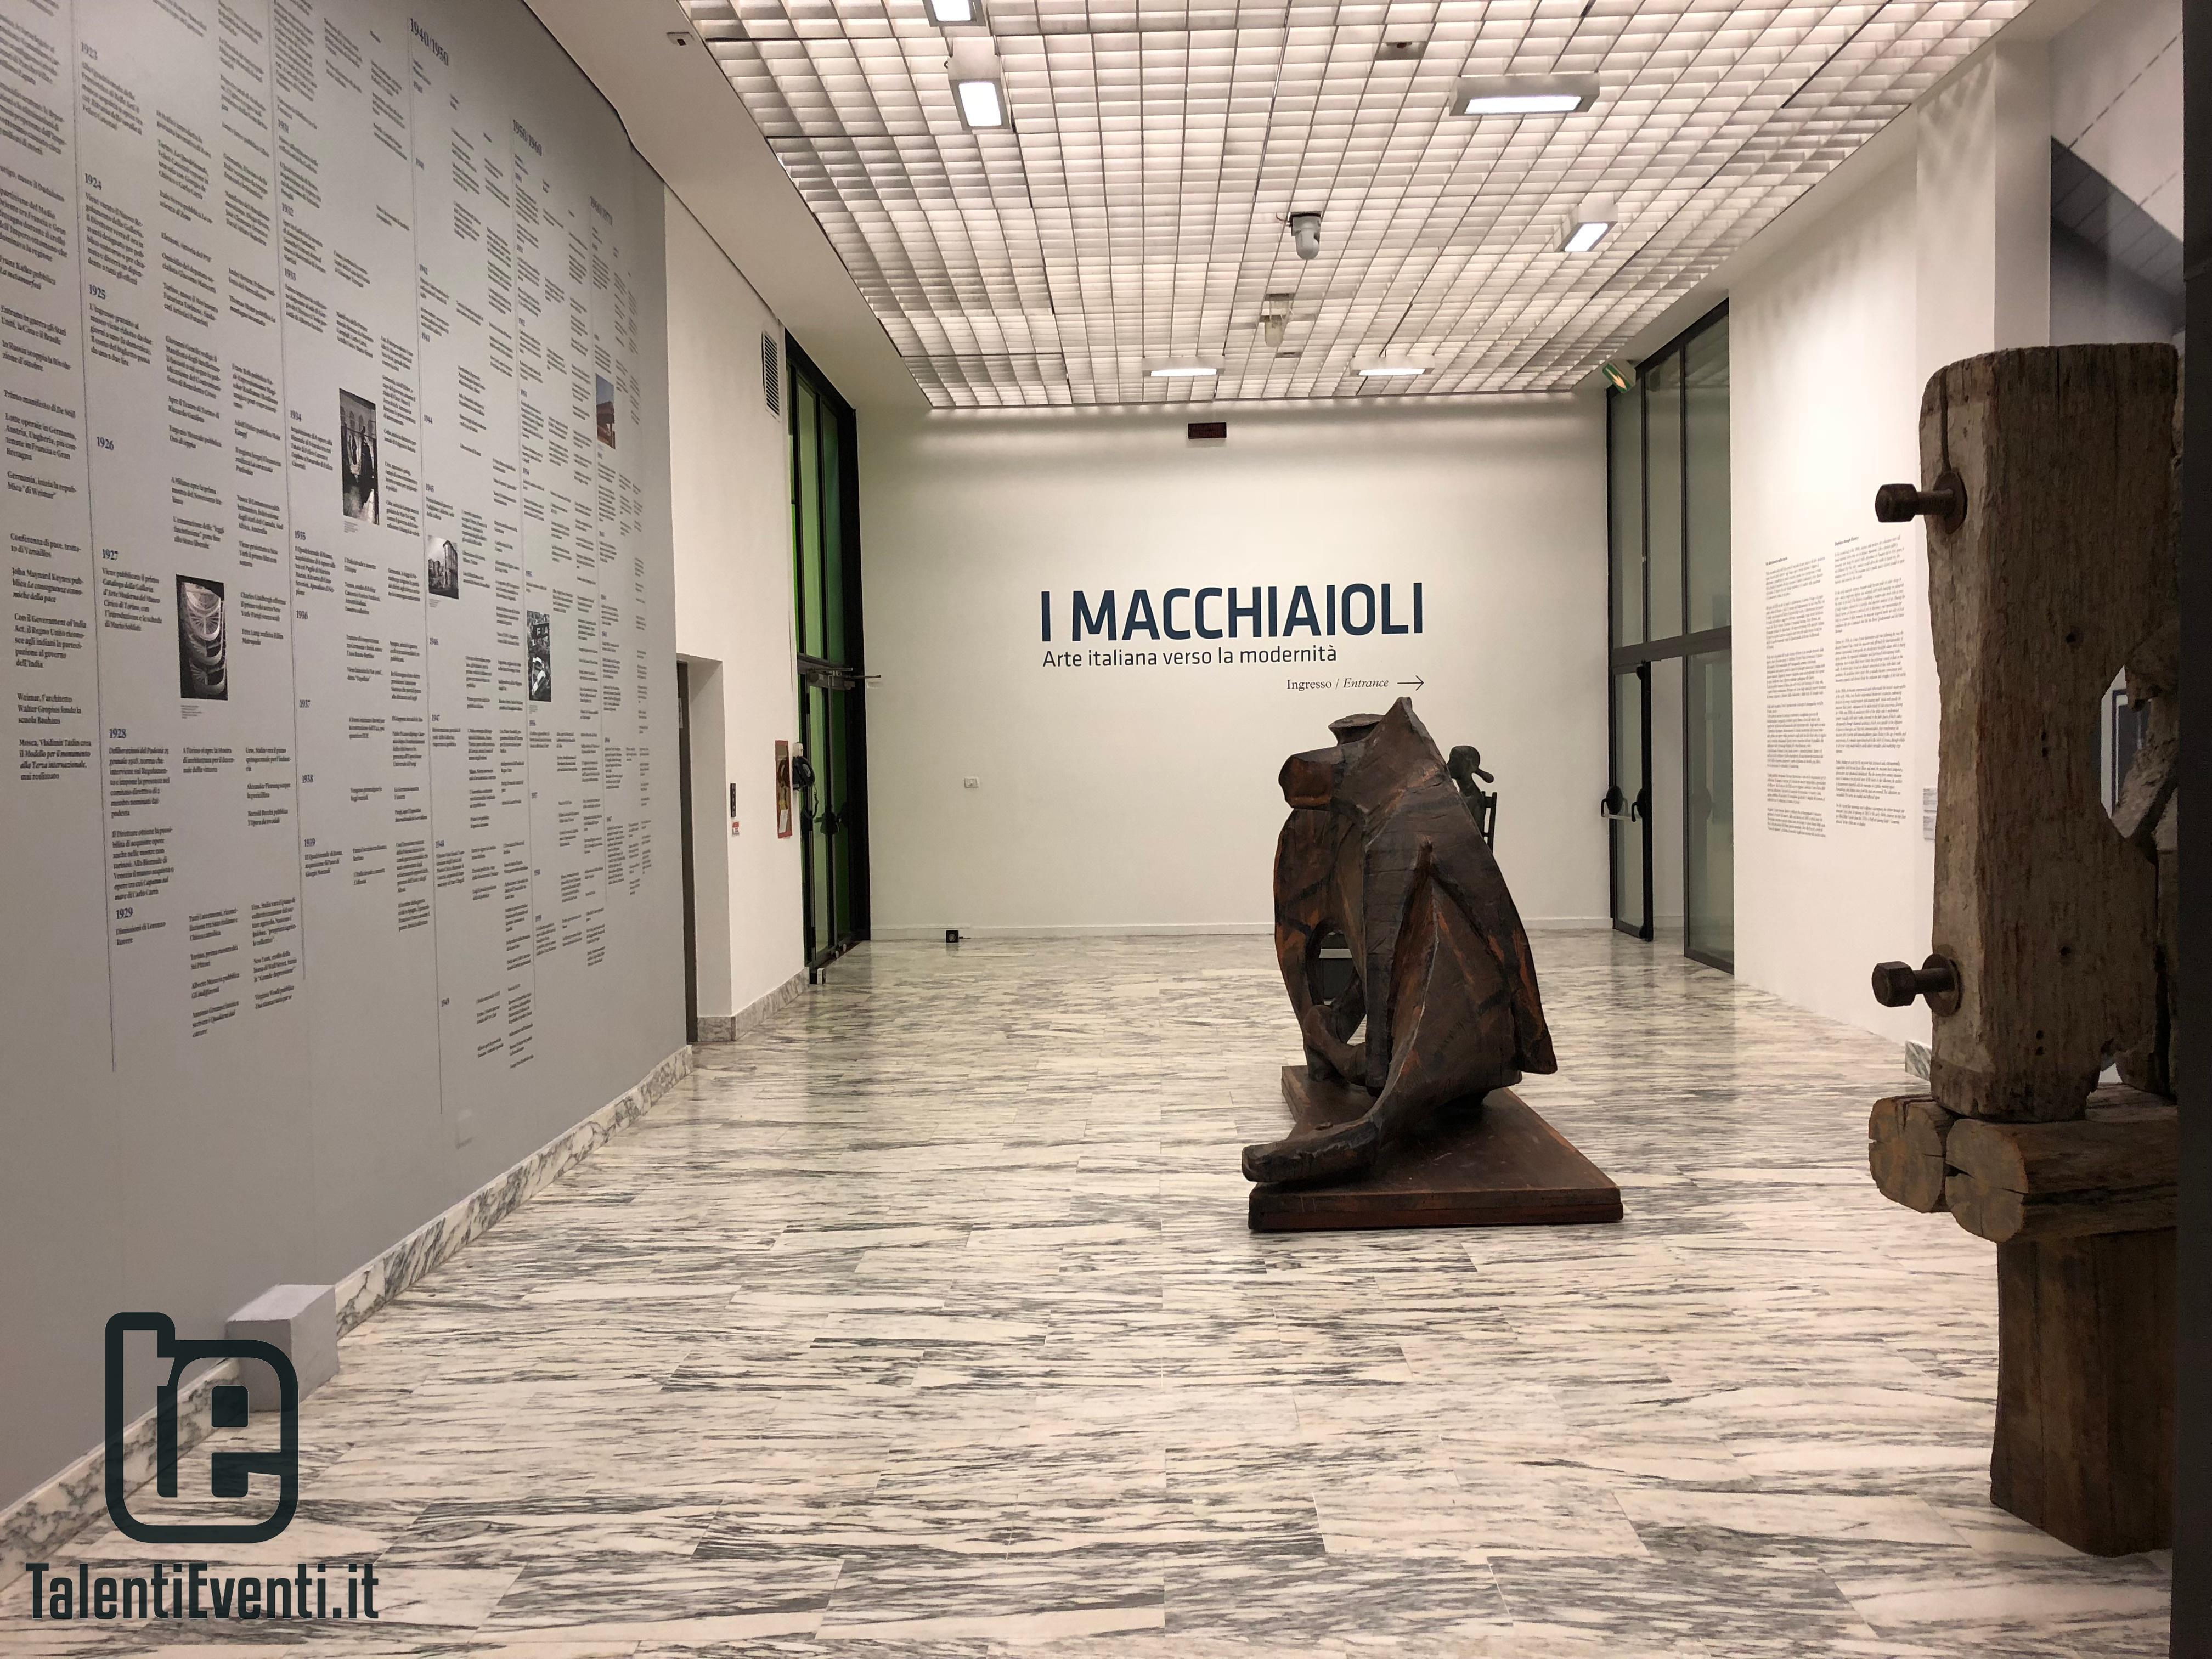 macchiaioli_Torino_Gam_TalentiEventi_1